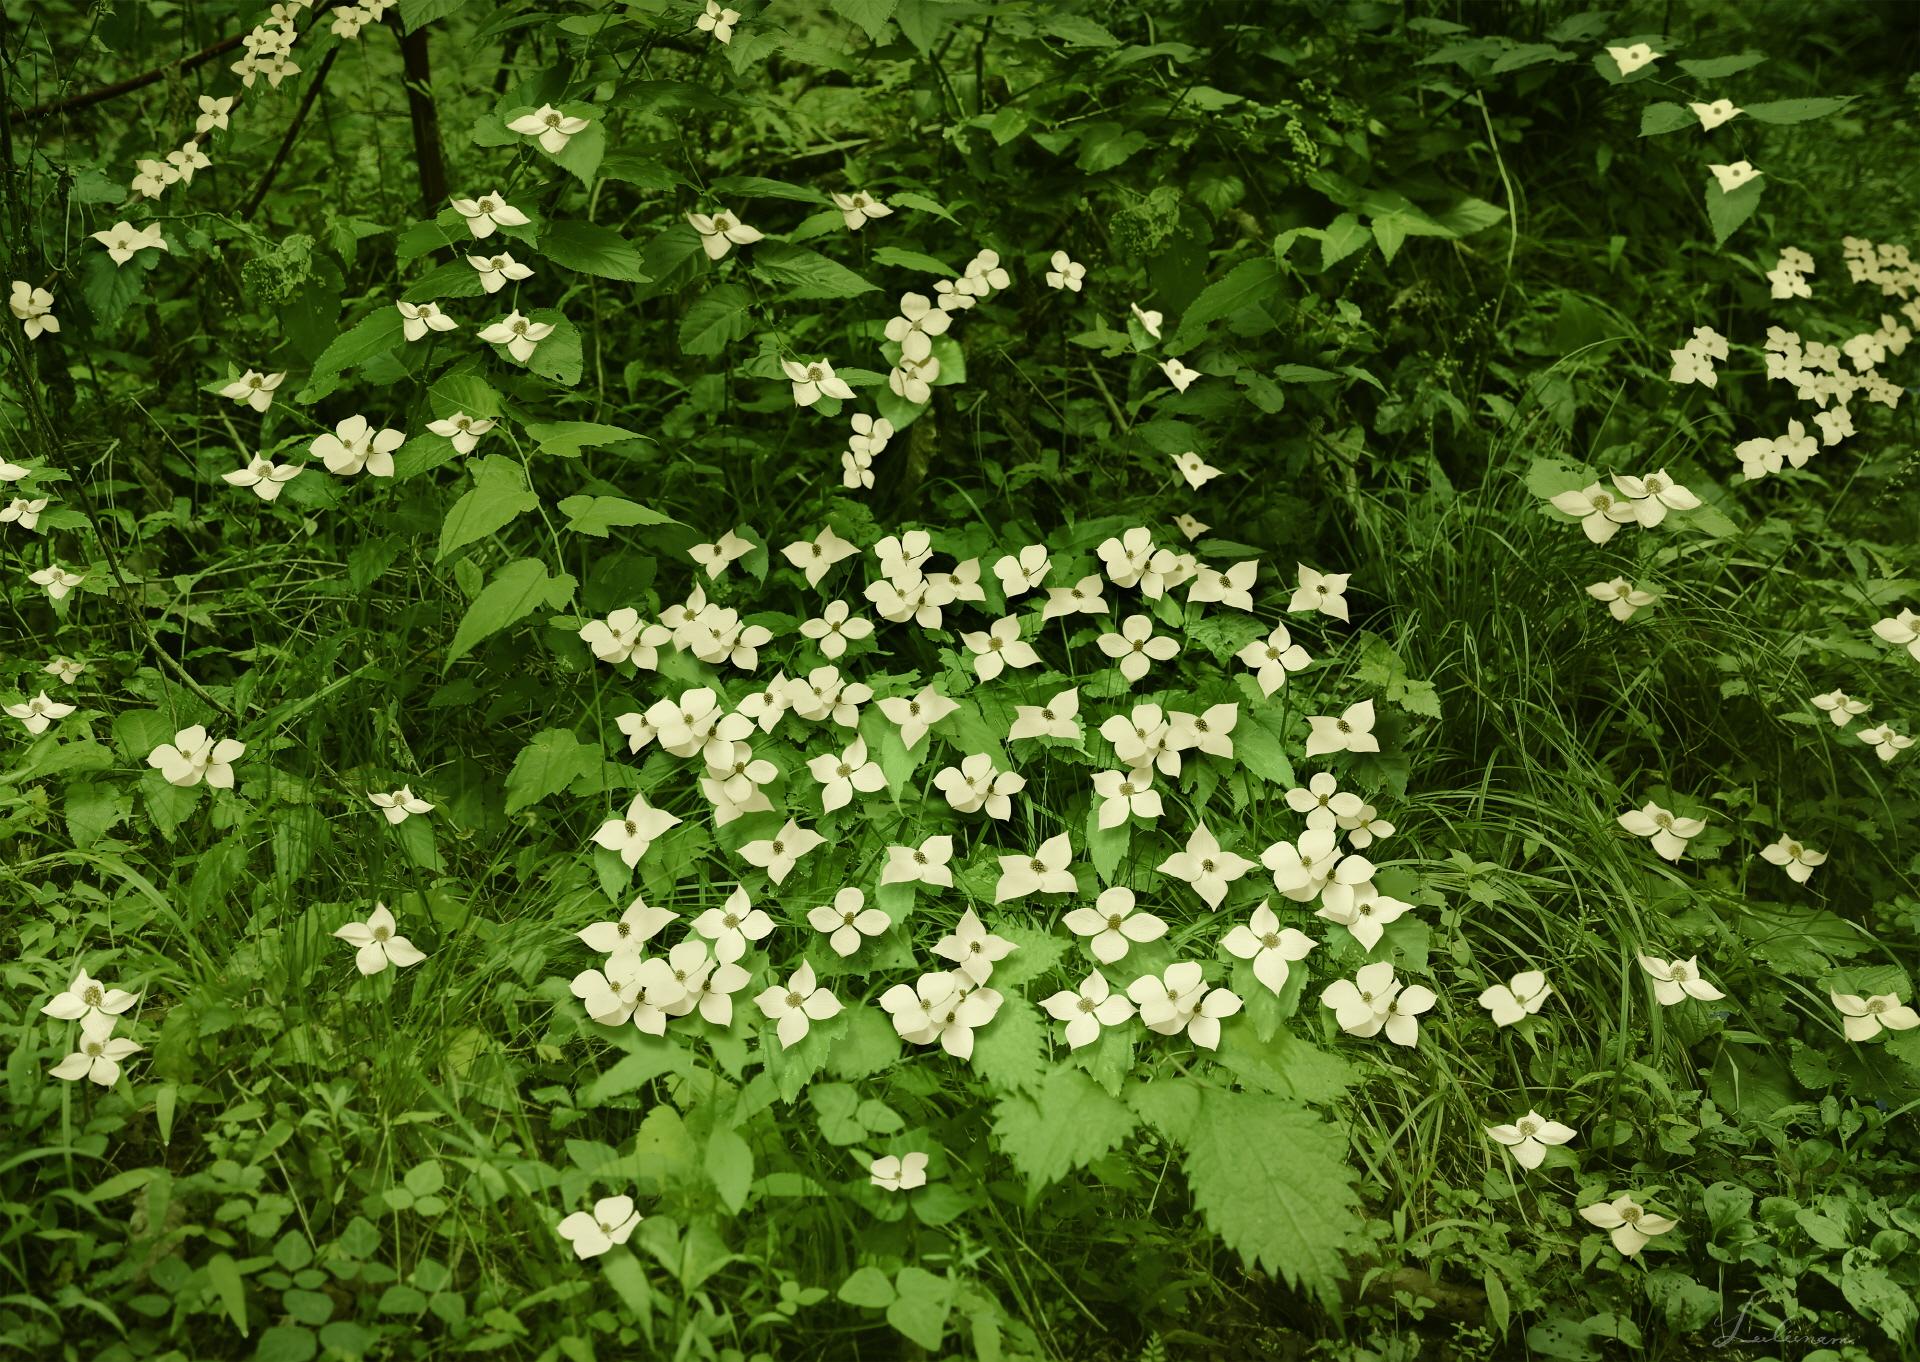 Lux-Flower 1 2014  C-PRINT 180x130cm